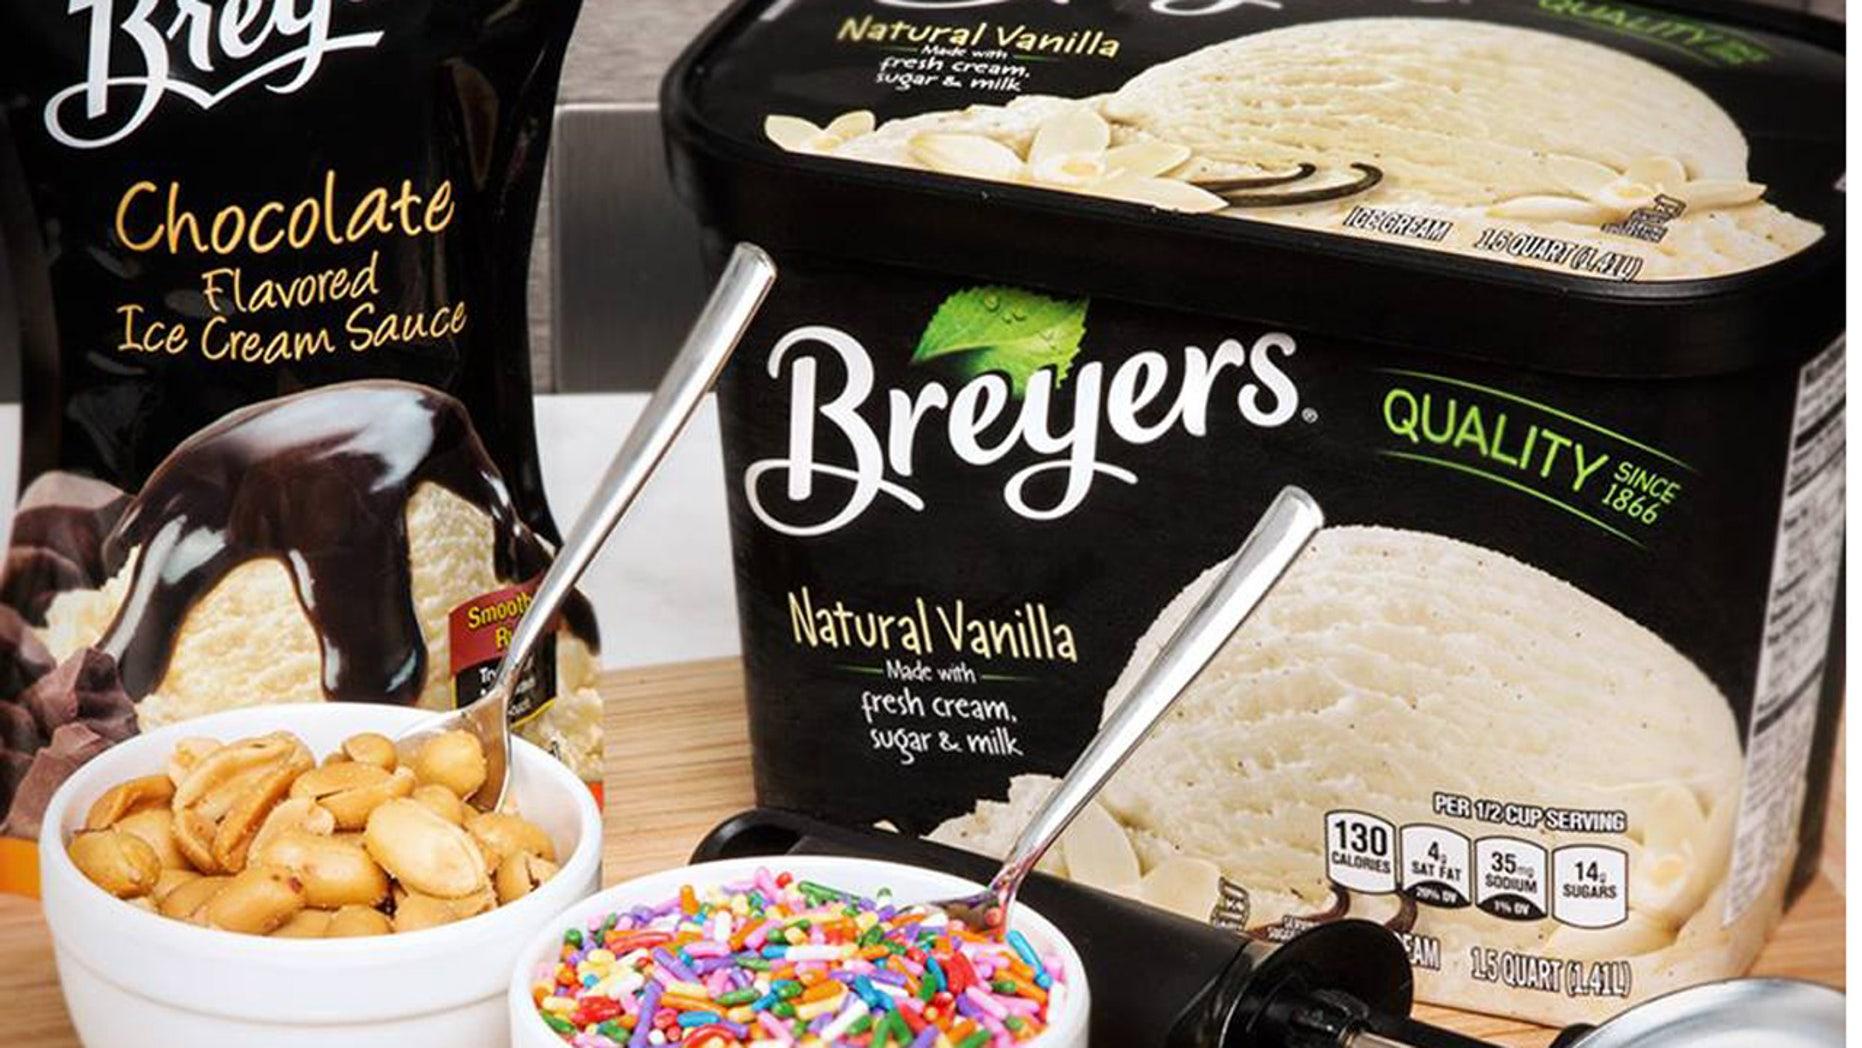 Basic vanilla may soon cost a premium price.